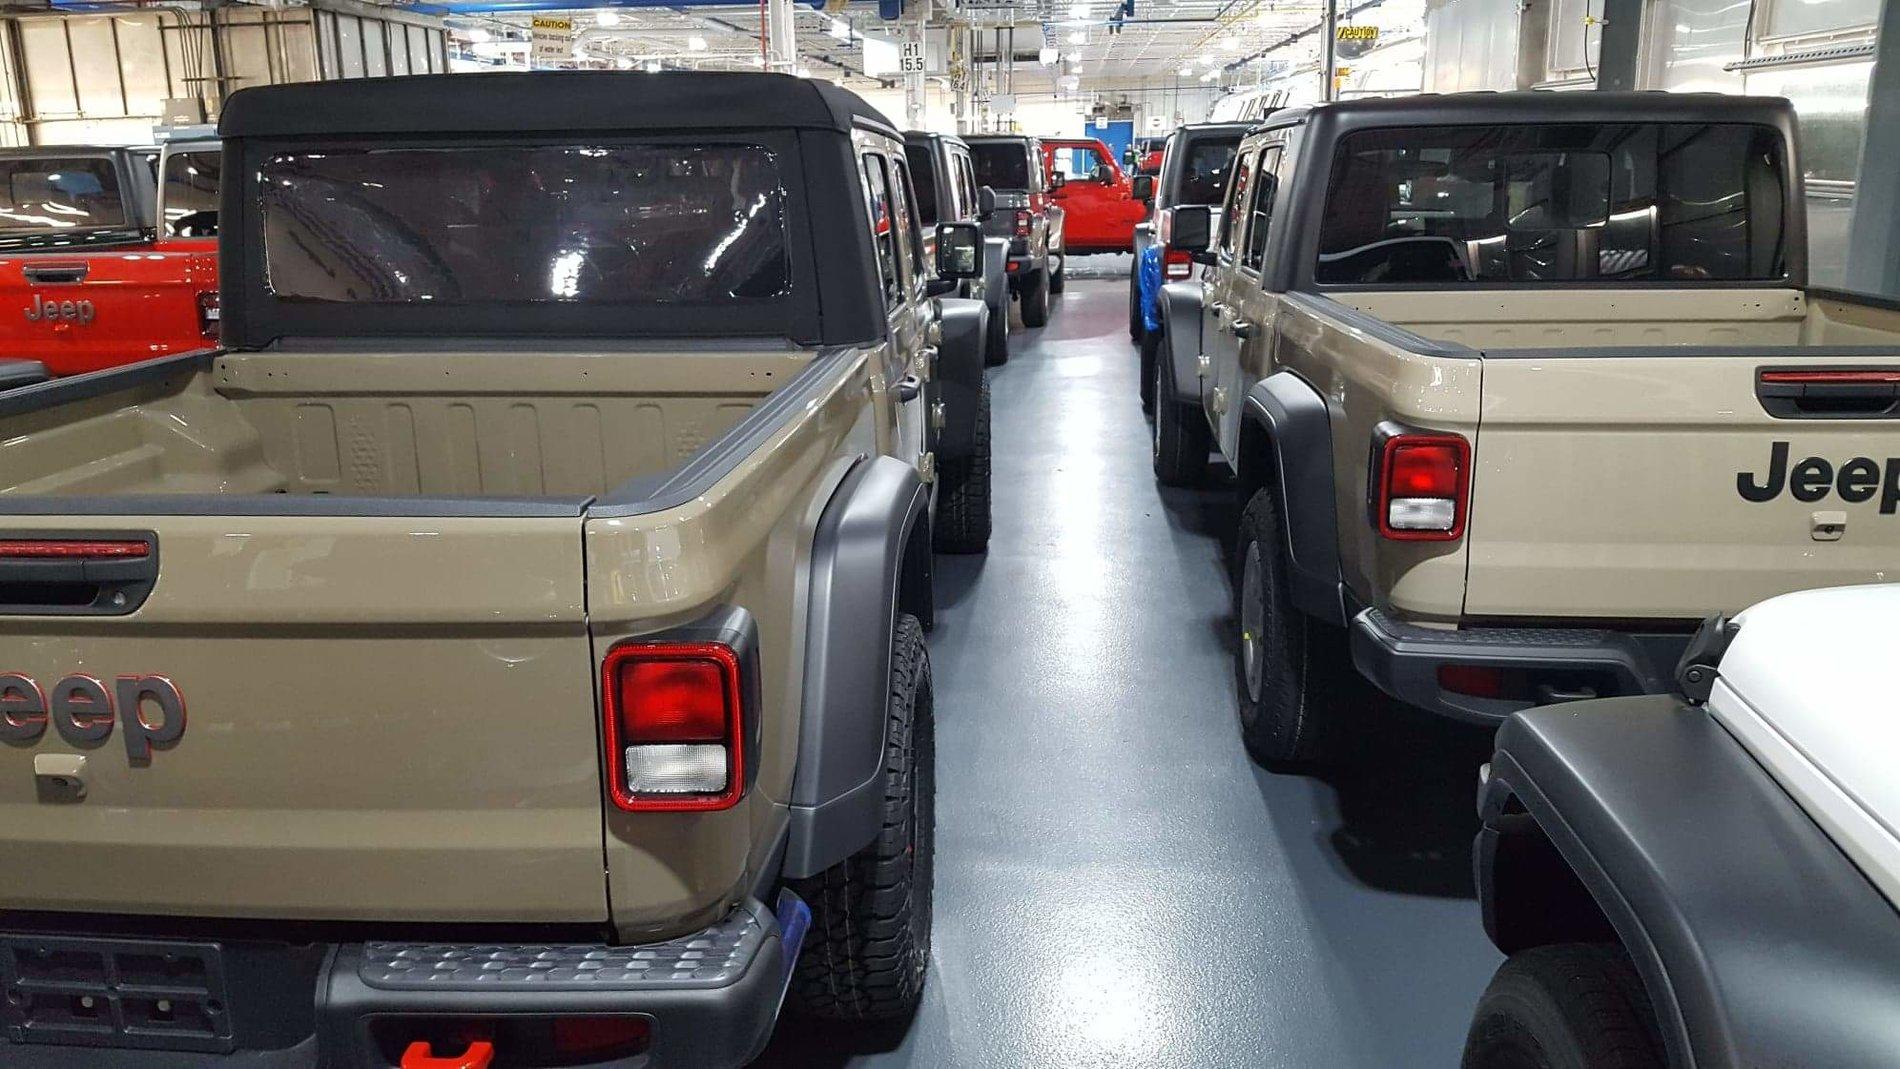 2020 Jeep Gladiator Gator Supercars Gallery